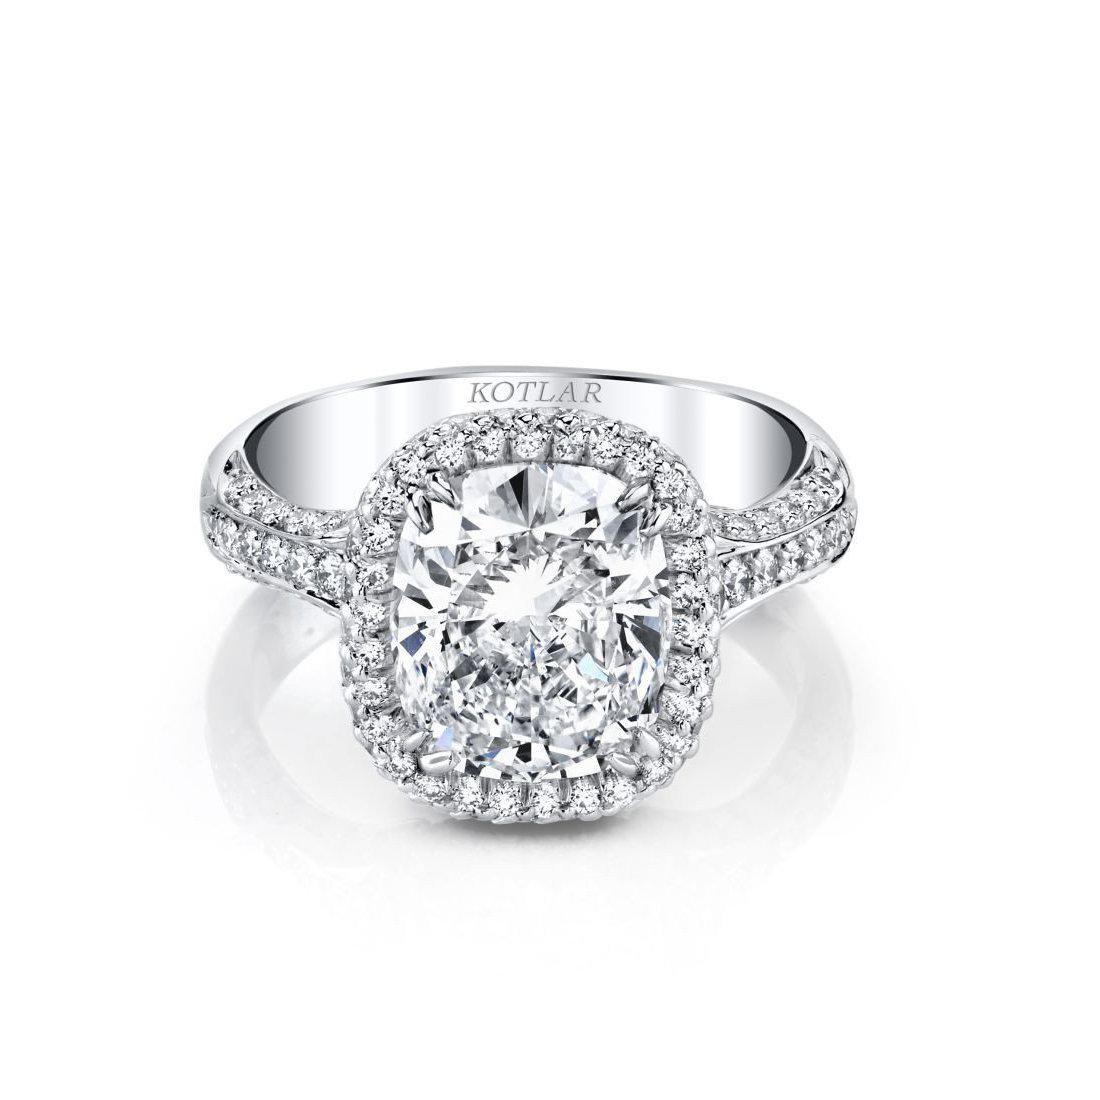 Harry Kotlar Kotlar Cushion Edwardian Ring in Metallic